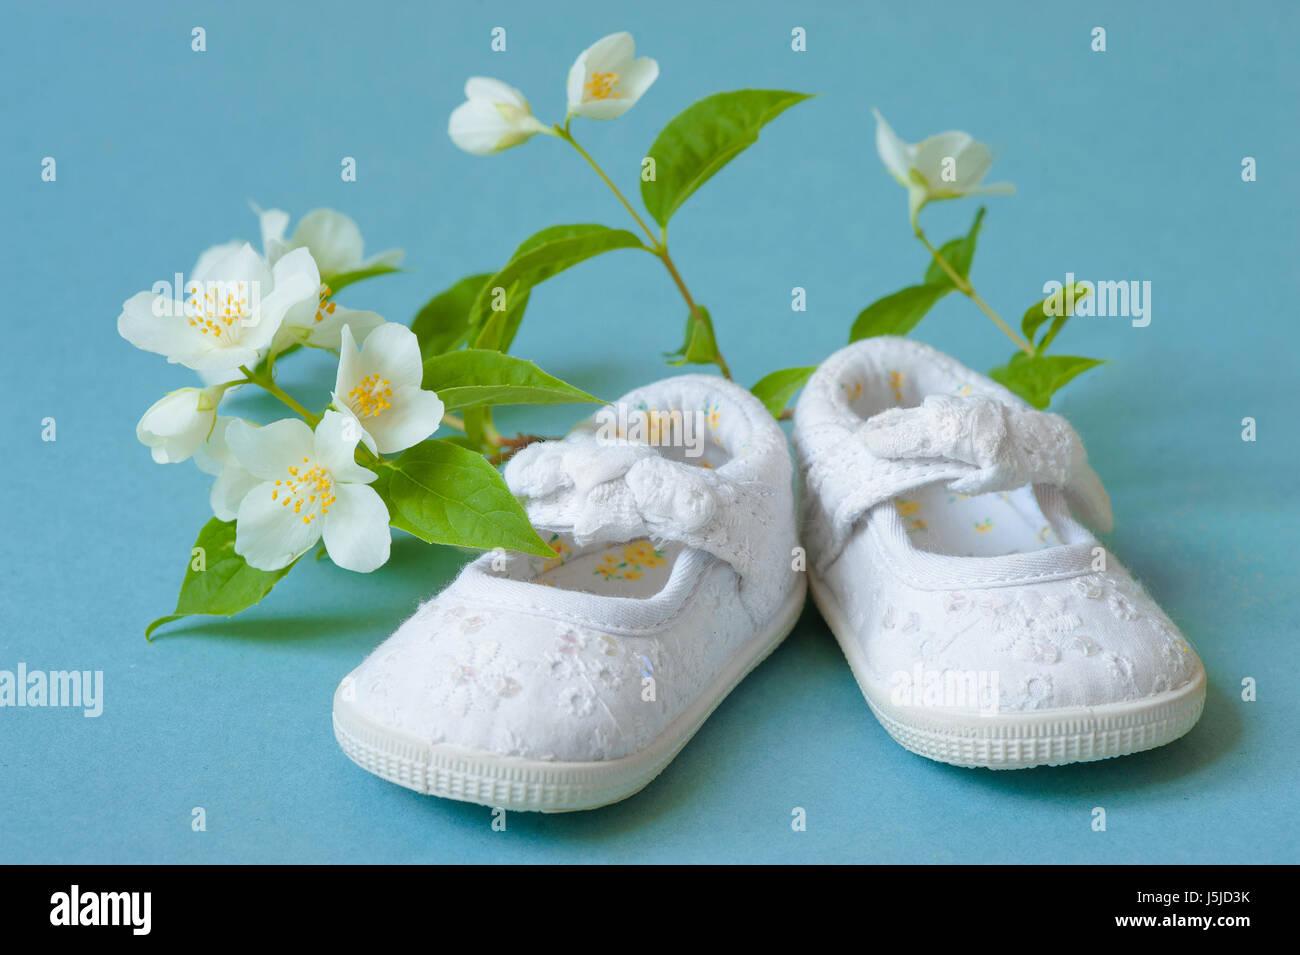 baby shower decoration - Stock Image